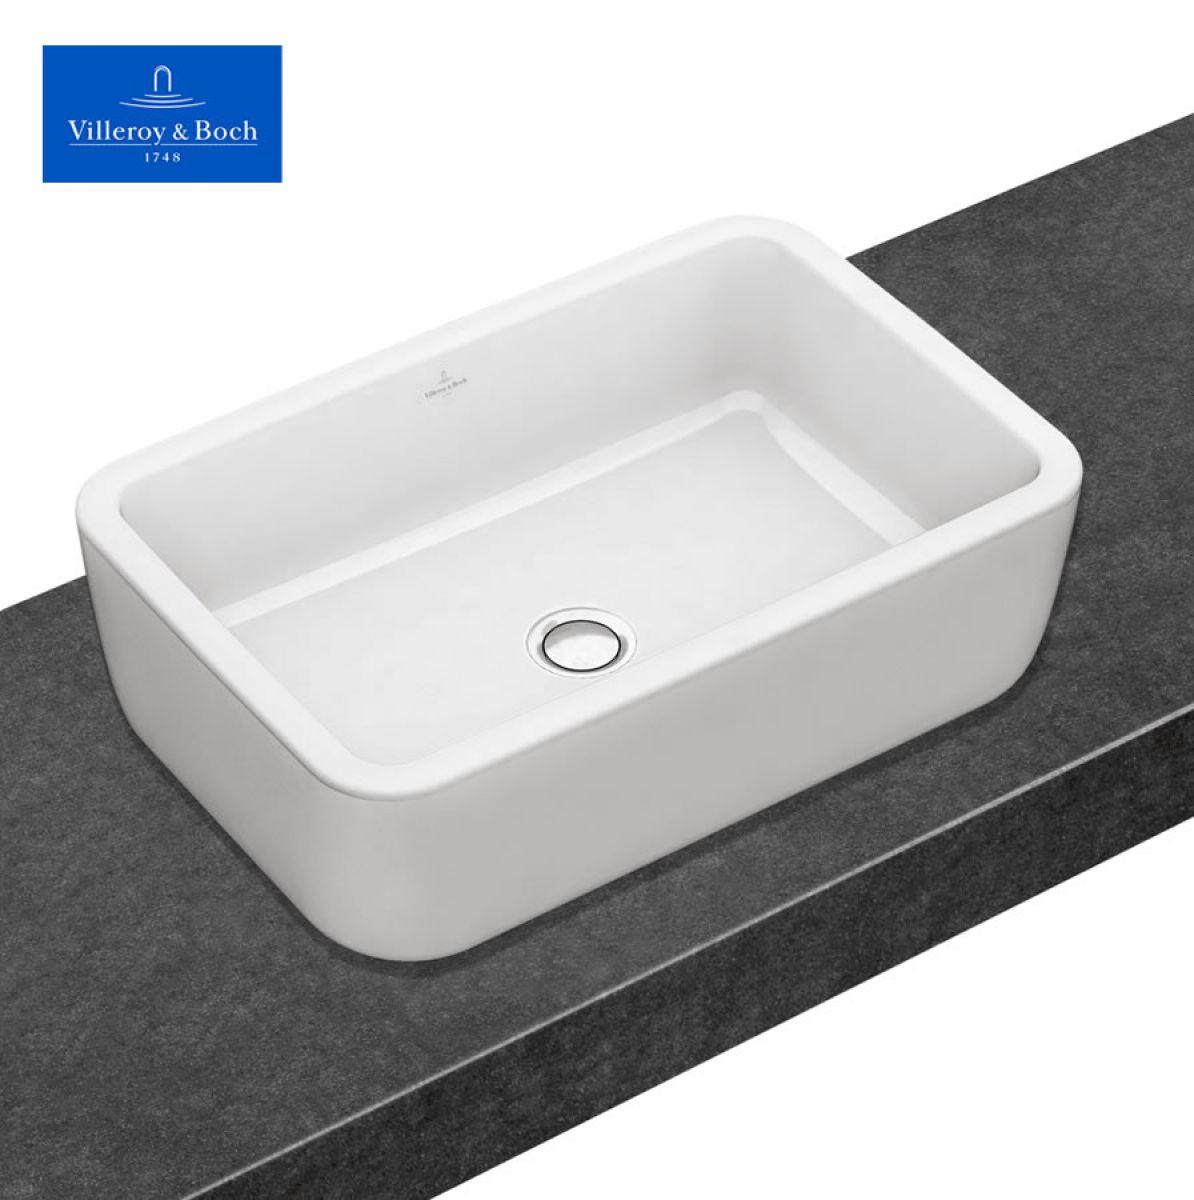 v b architectura rectangle surface mounted washbasin uk bathrooms. Black Bedroom Furniture Sets. Home Design Ideas